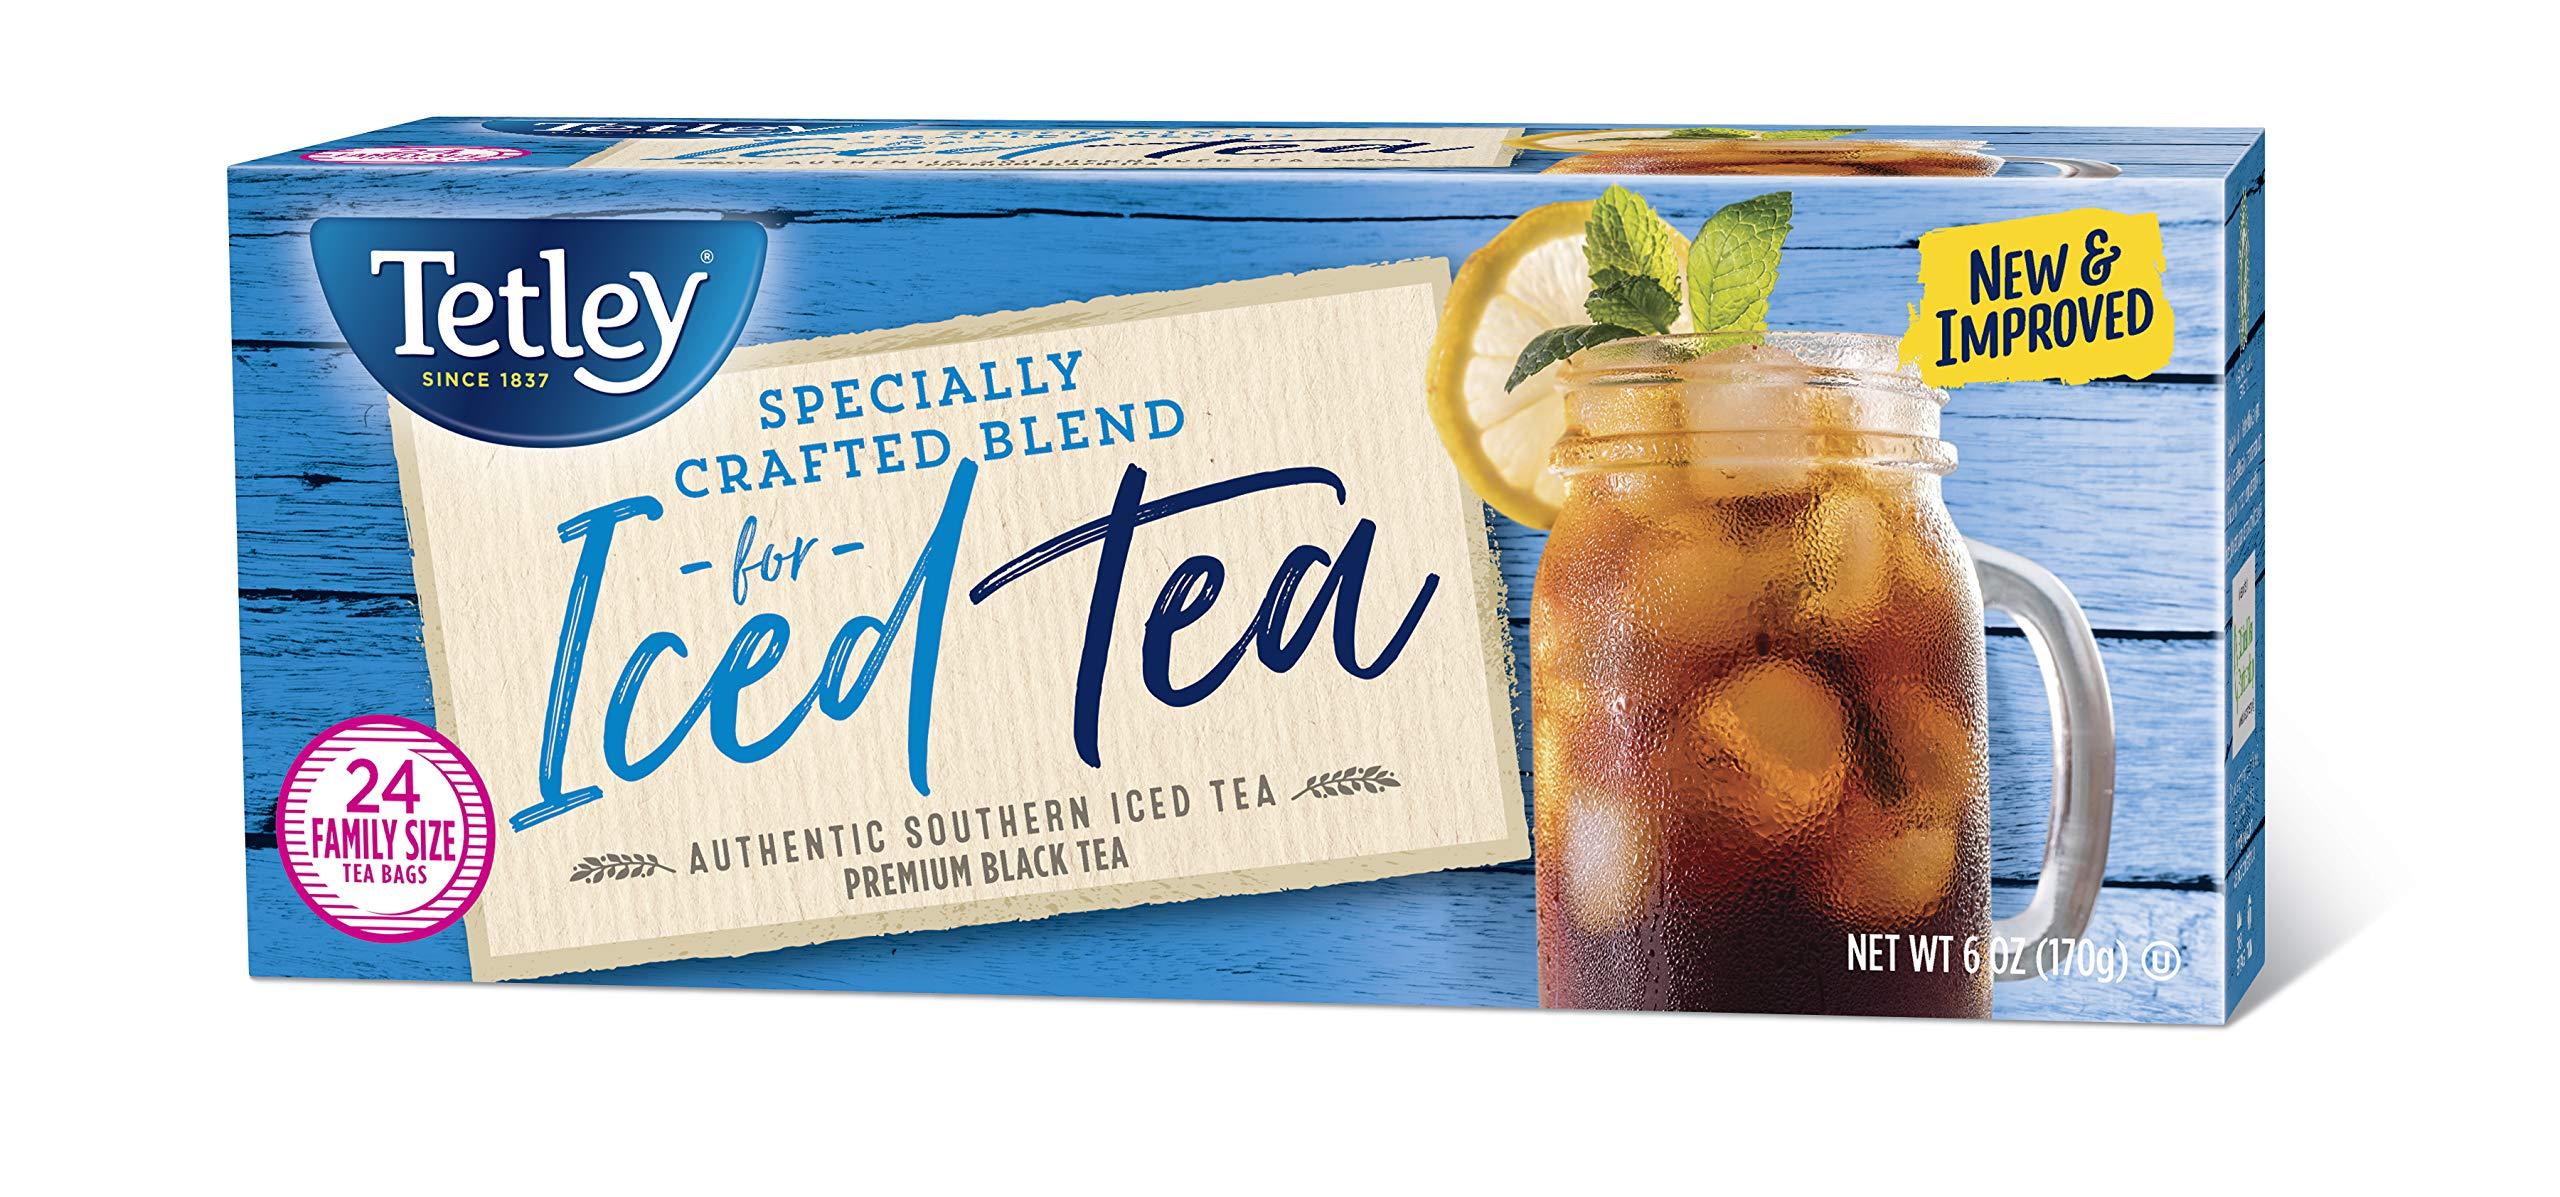 Tetley Black Tea, Iced Tea Blend, Family Size, 24 Round Tea Bags (Pack of 6) by Tetley